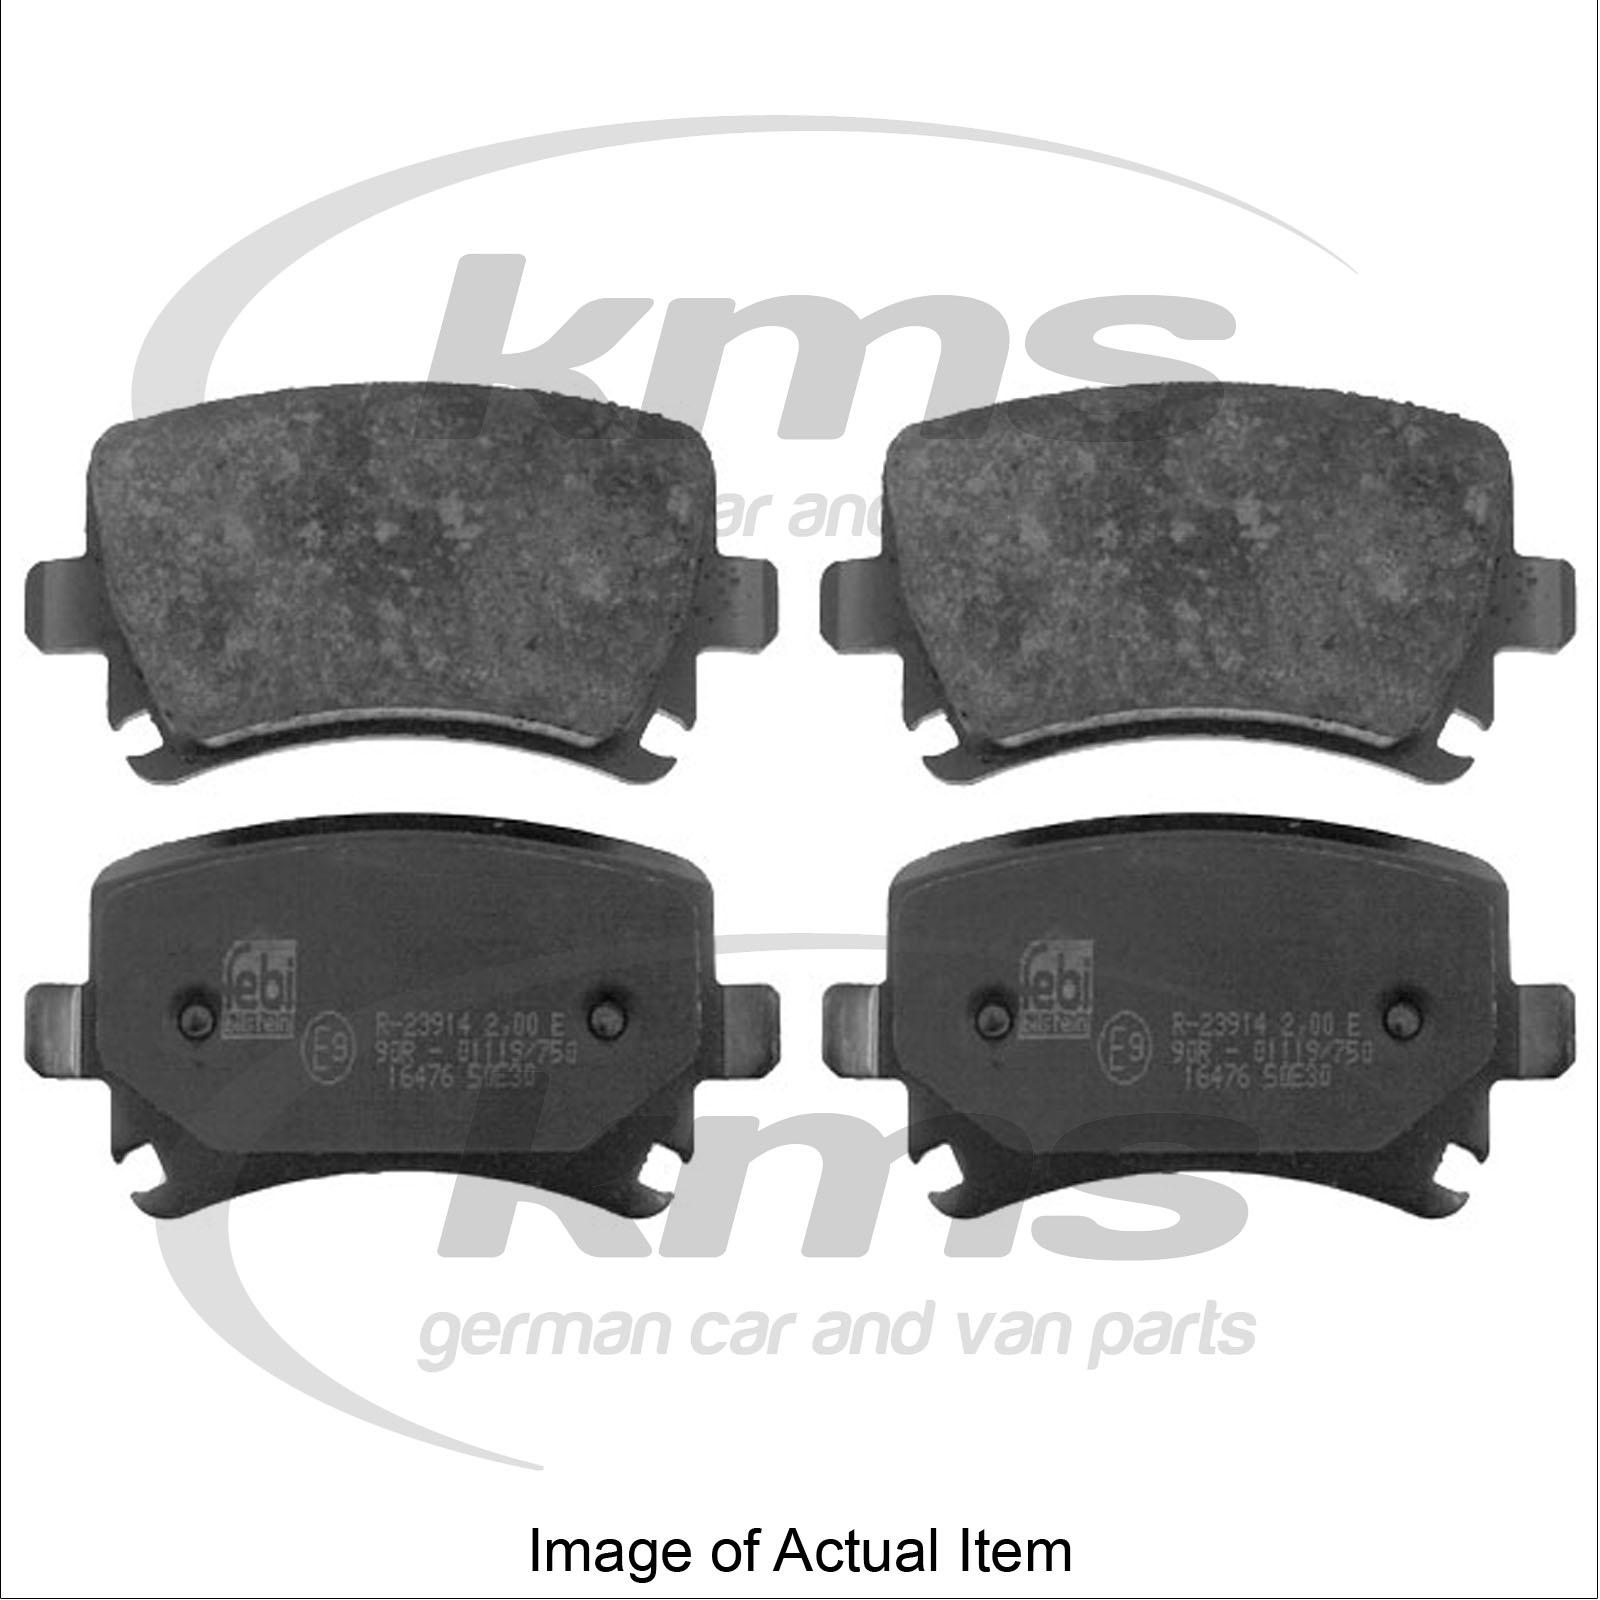 BRAKE PADS Audi A6 Estate Quattro Avant C6 (2004-2012) 2